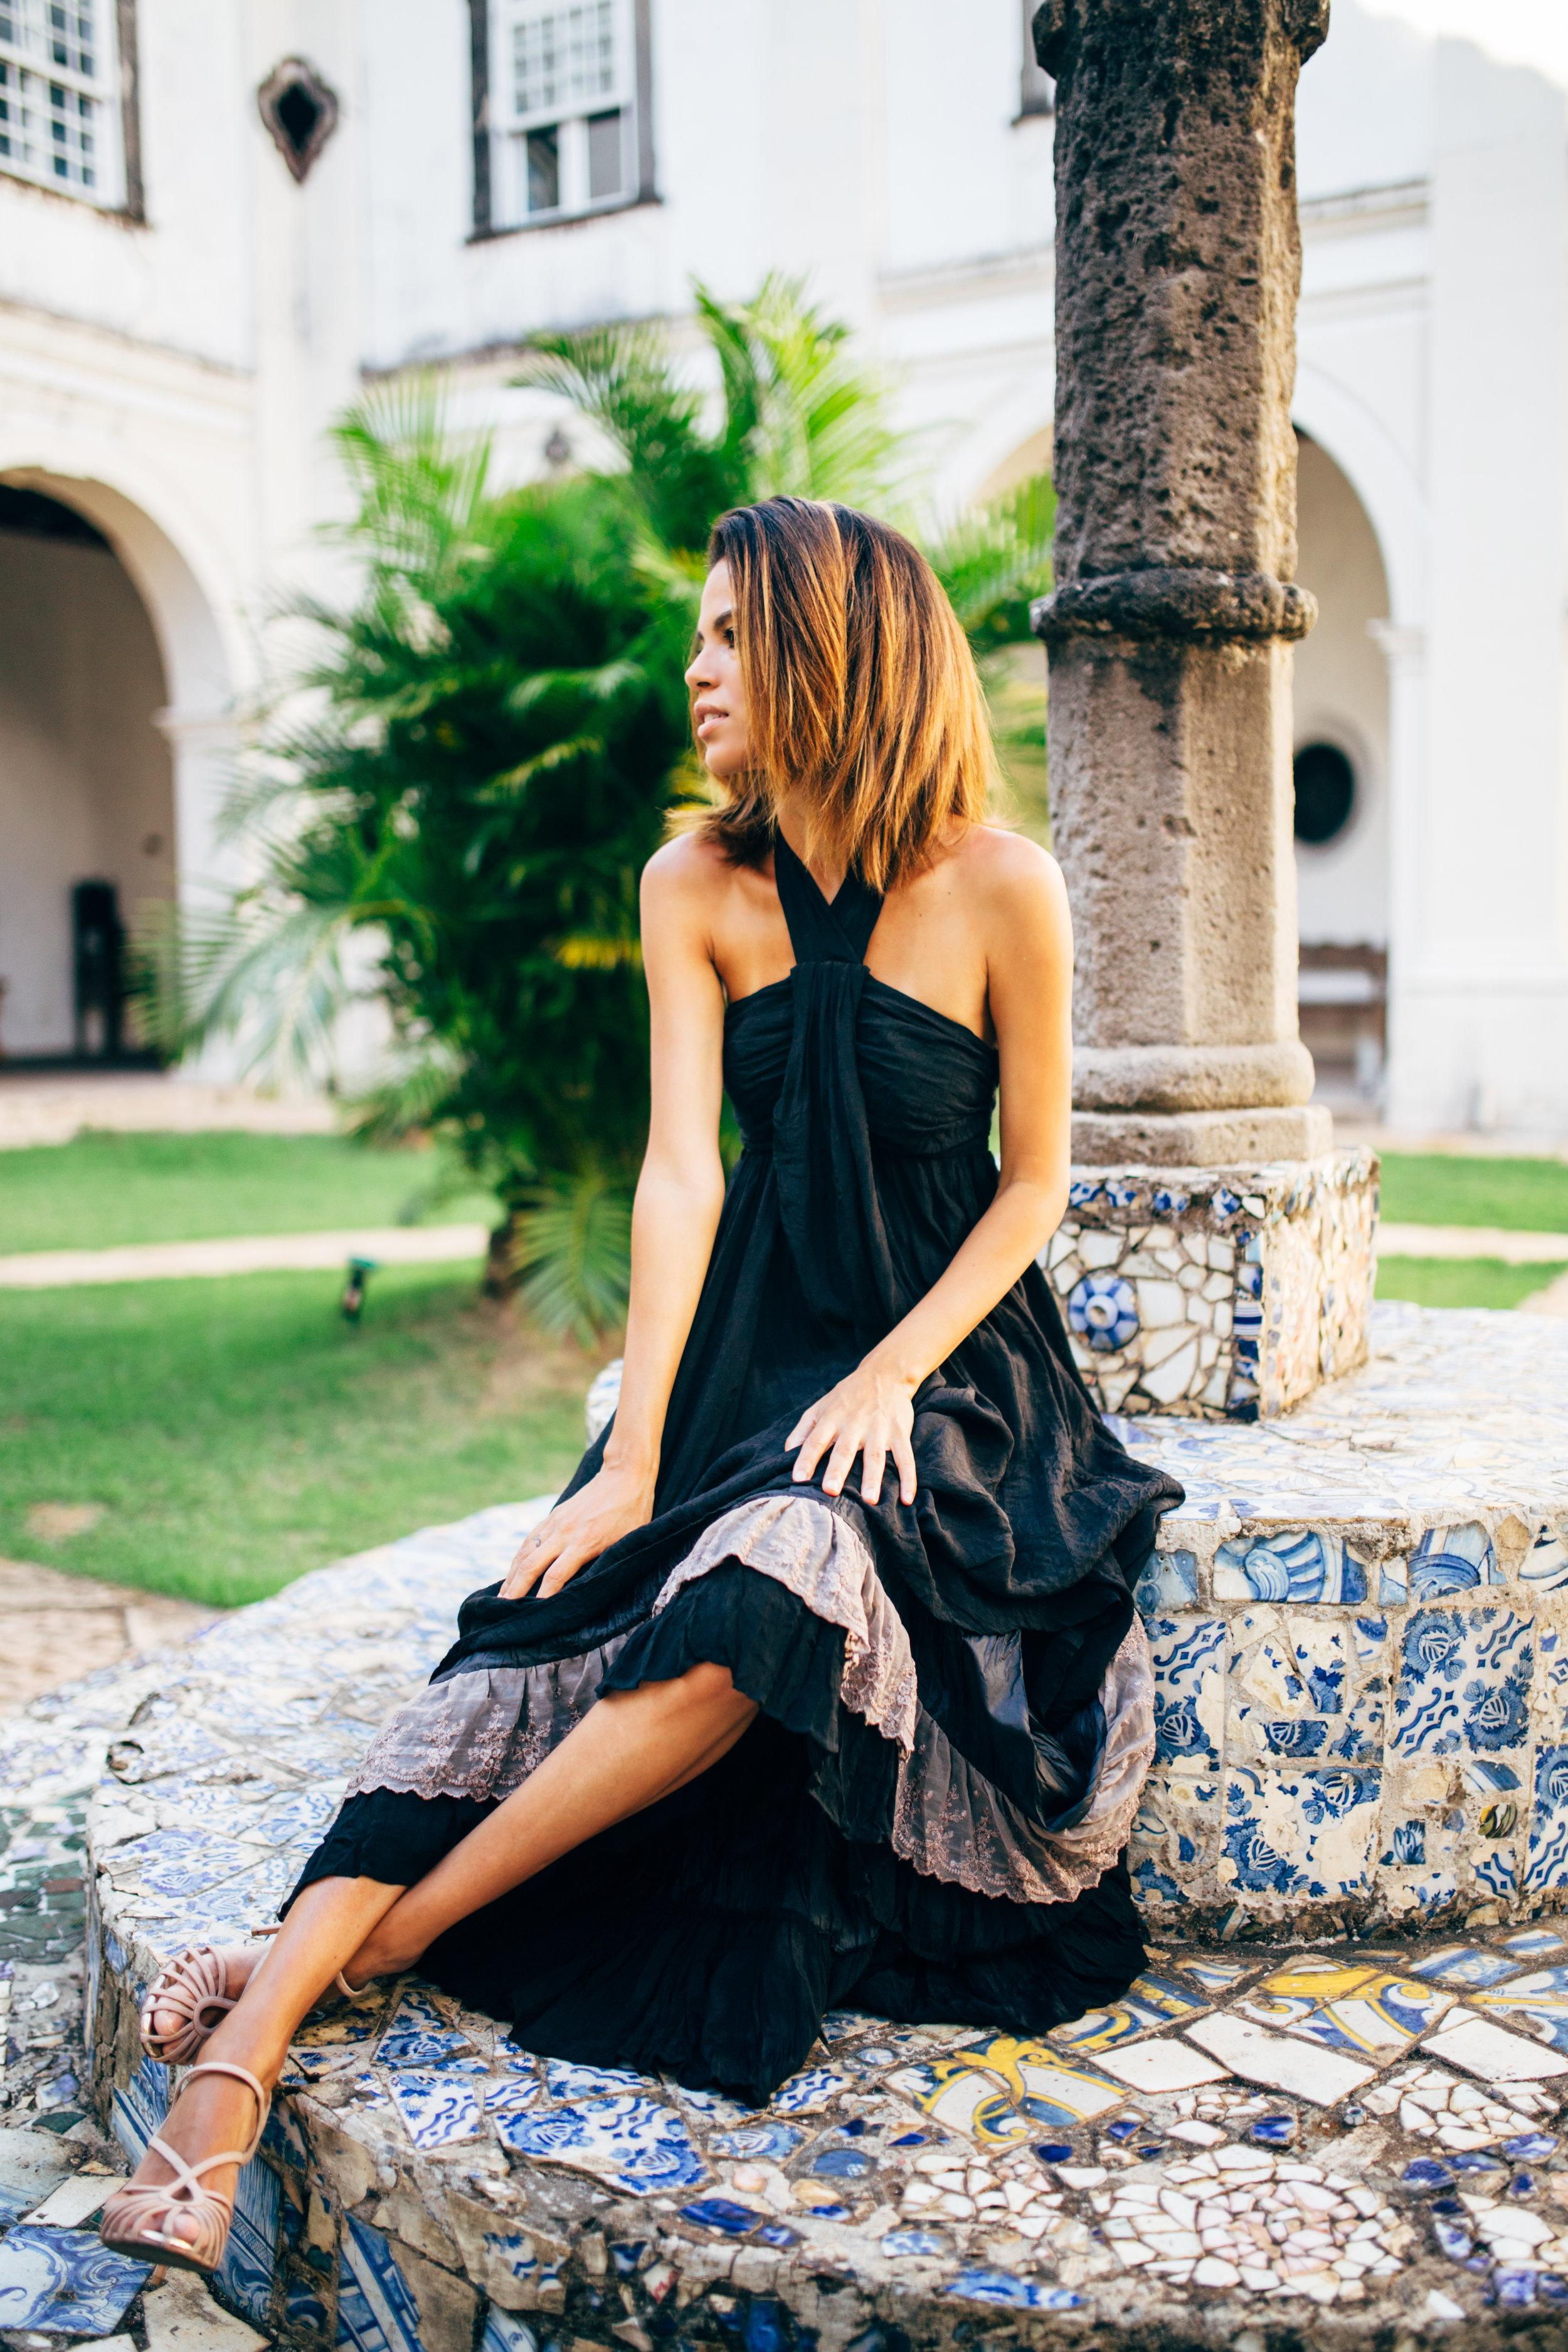 Brazilian Style - Salvador - AROSE TRAVELS